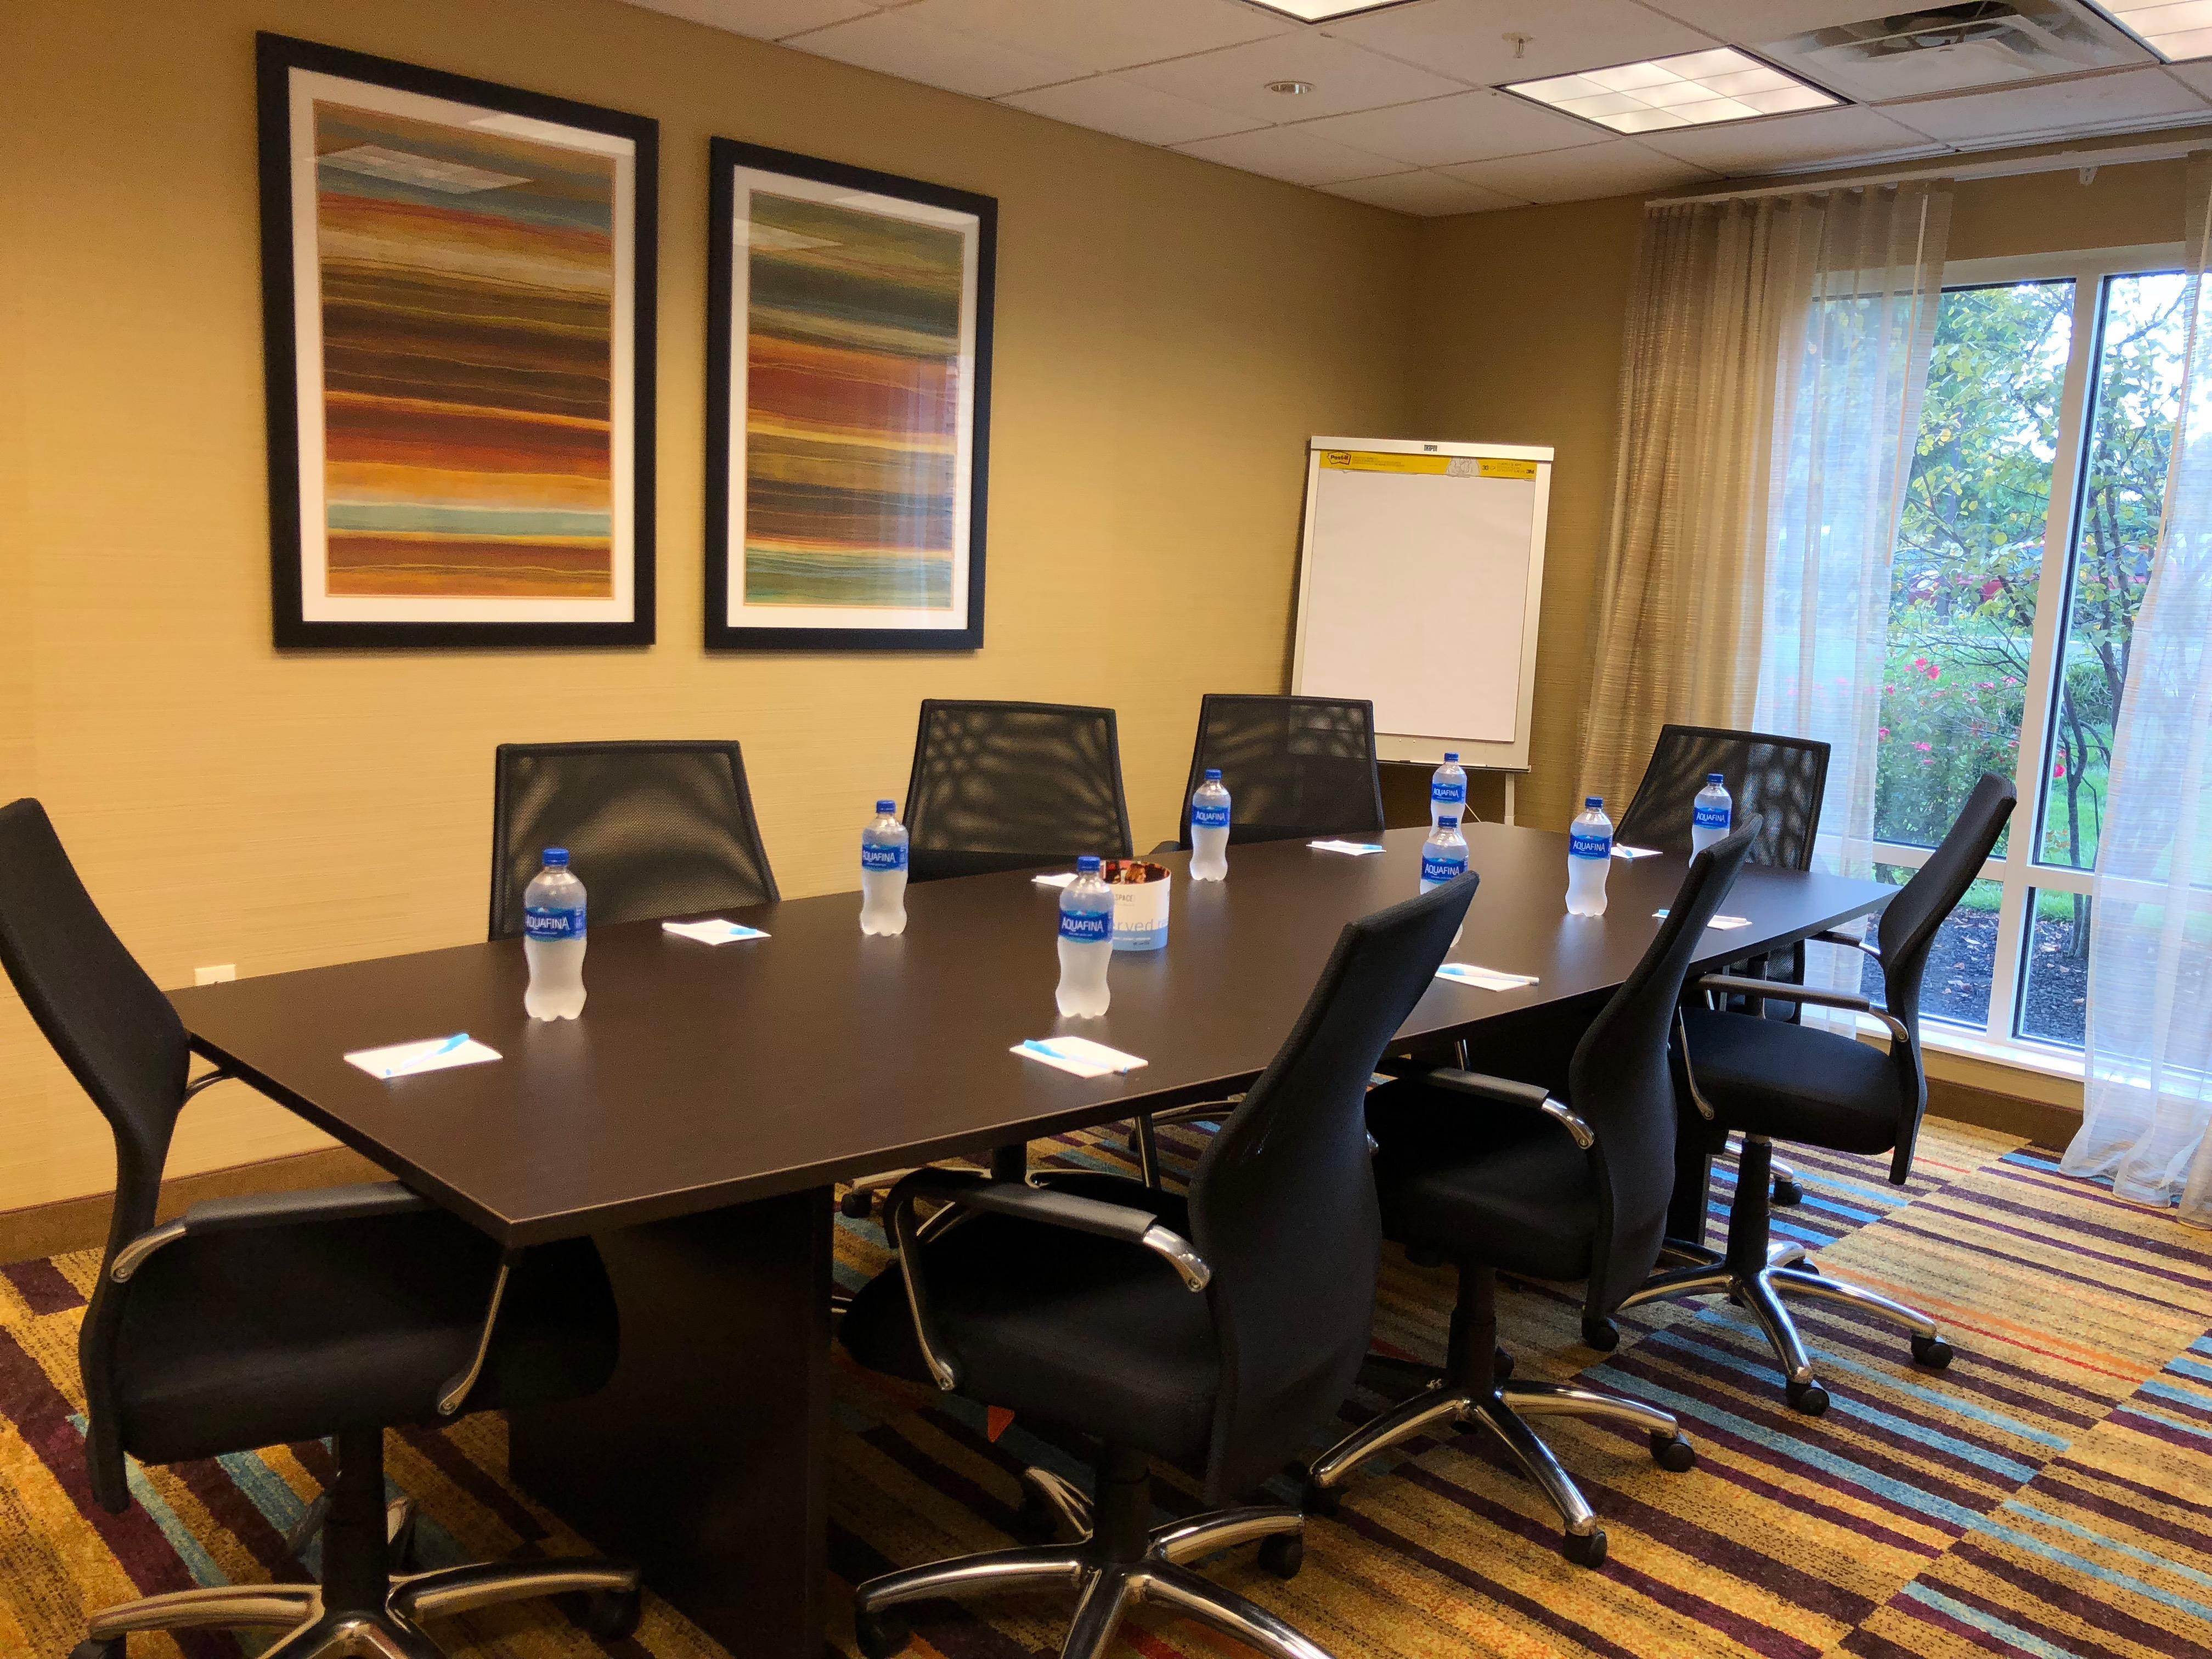 Fairfield Inn & Suites Kennett Square Brandywine Valley - Winterthur Boardroom